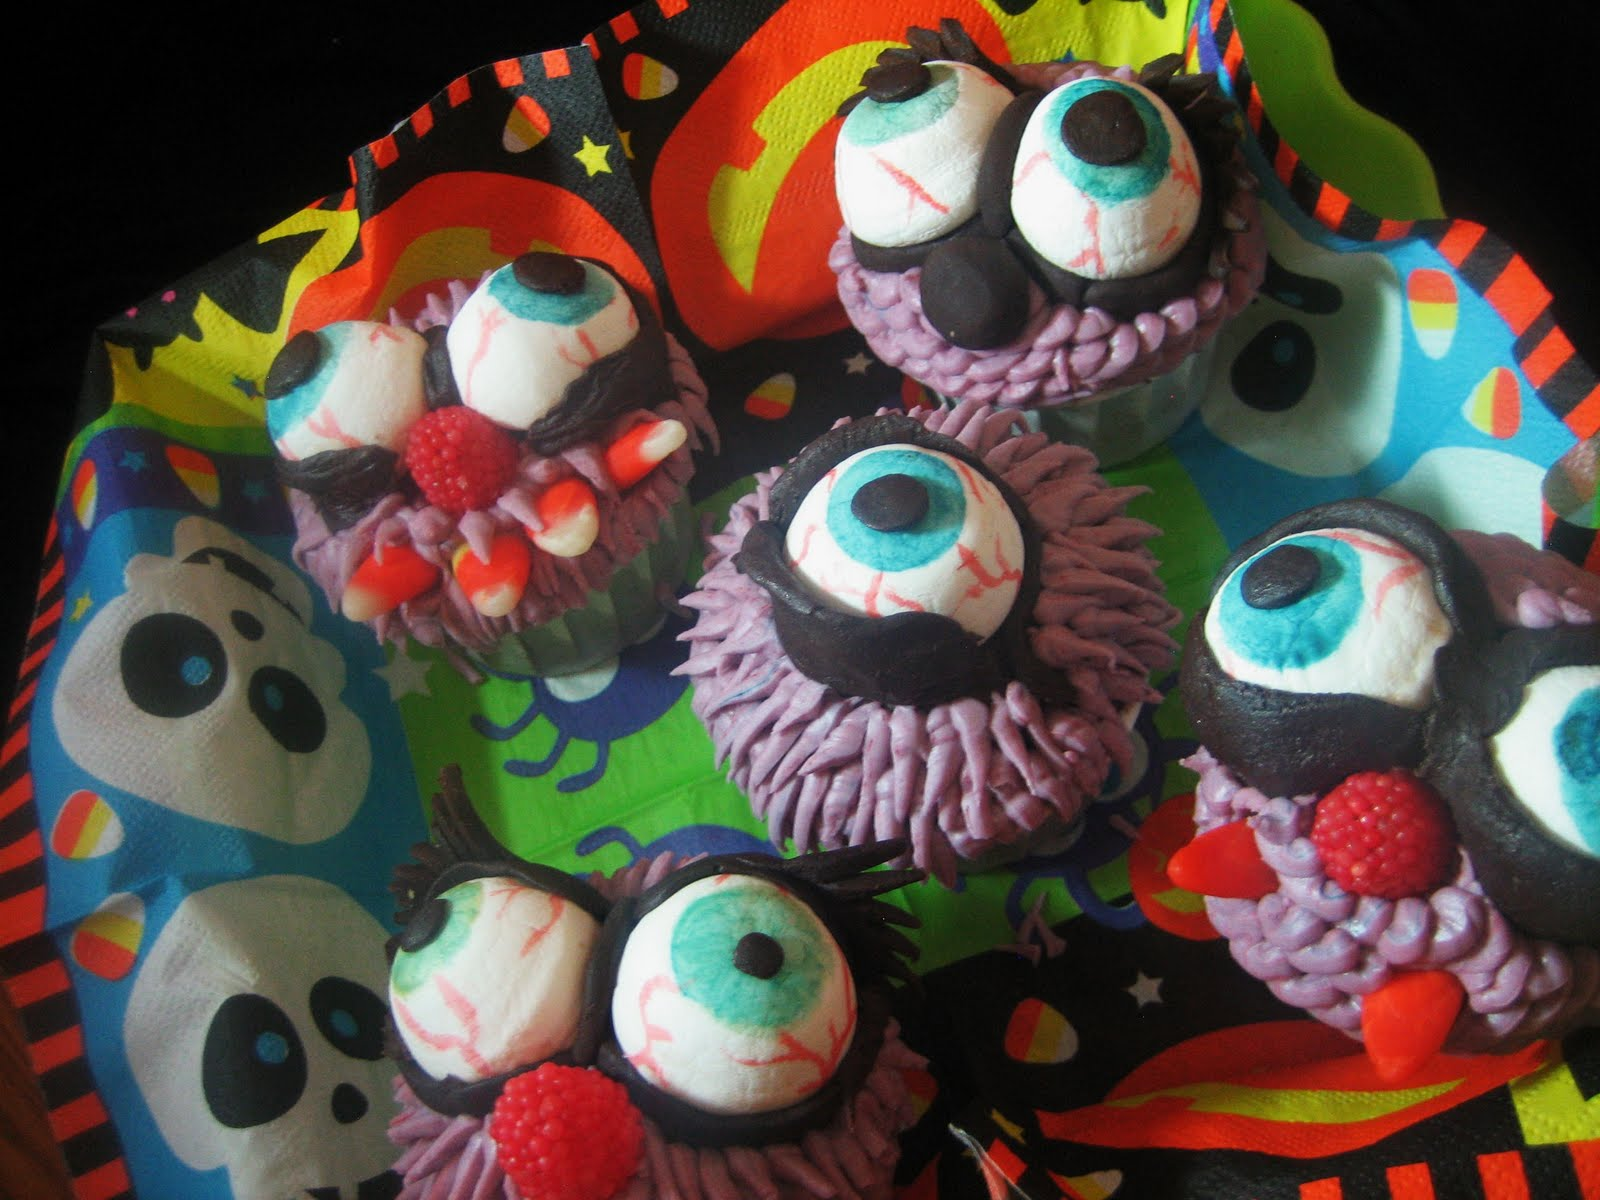 Chef Tess Bakeresse: Halloween Monster Eyeball Cupcakes